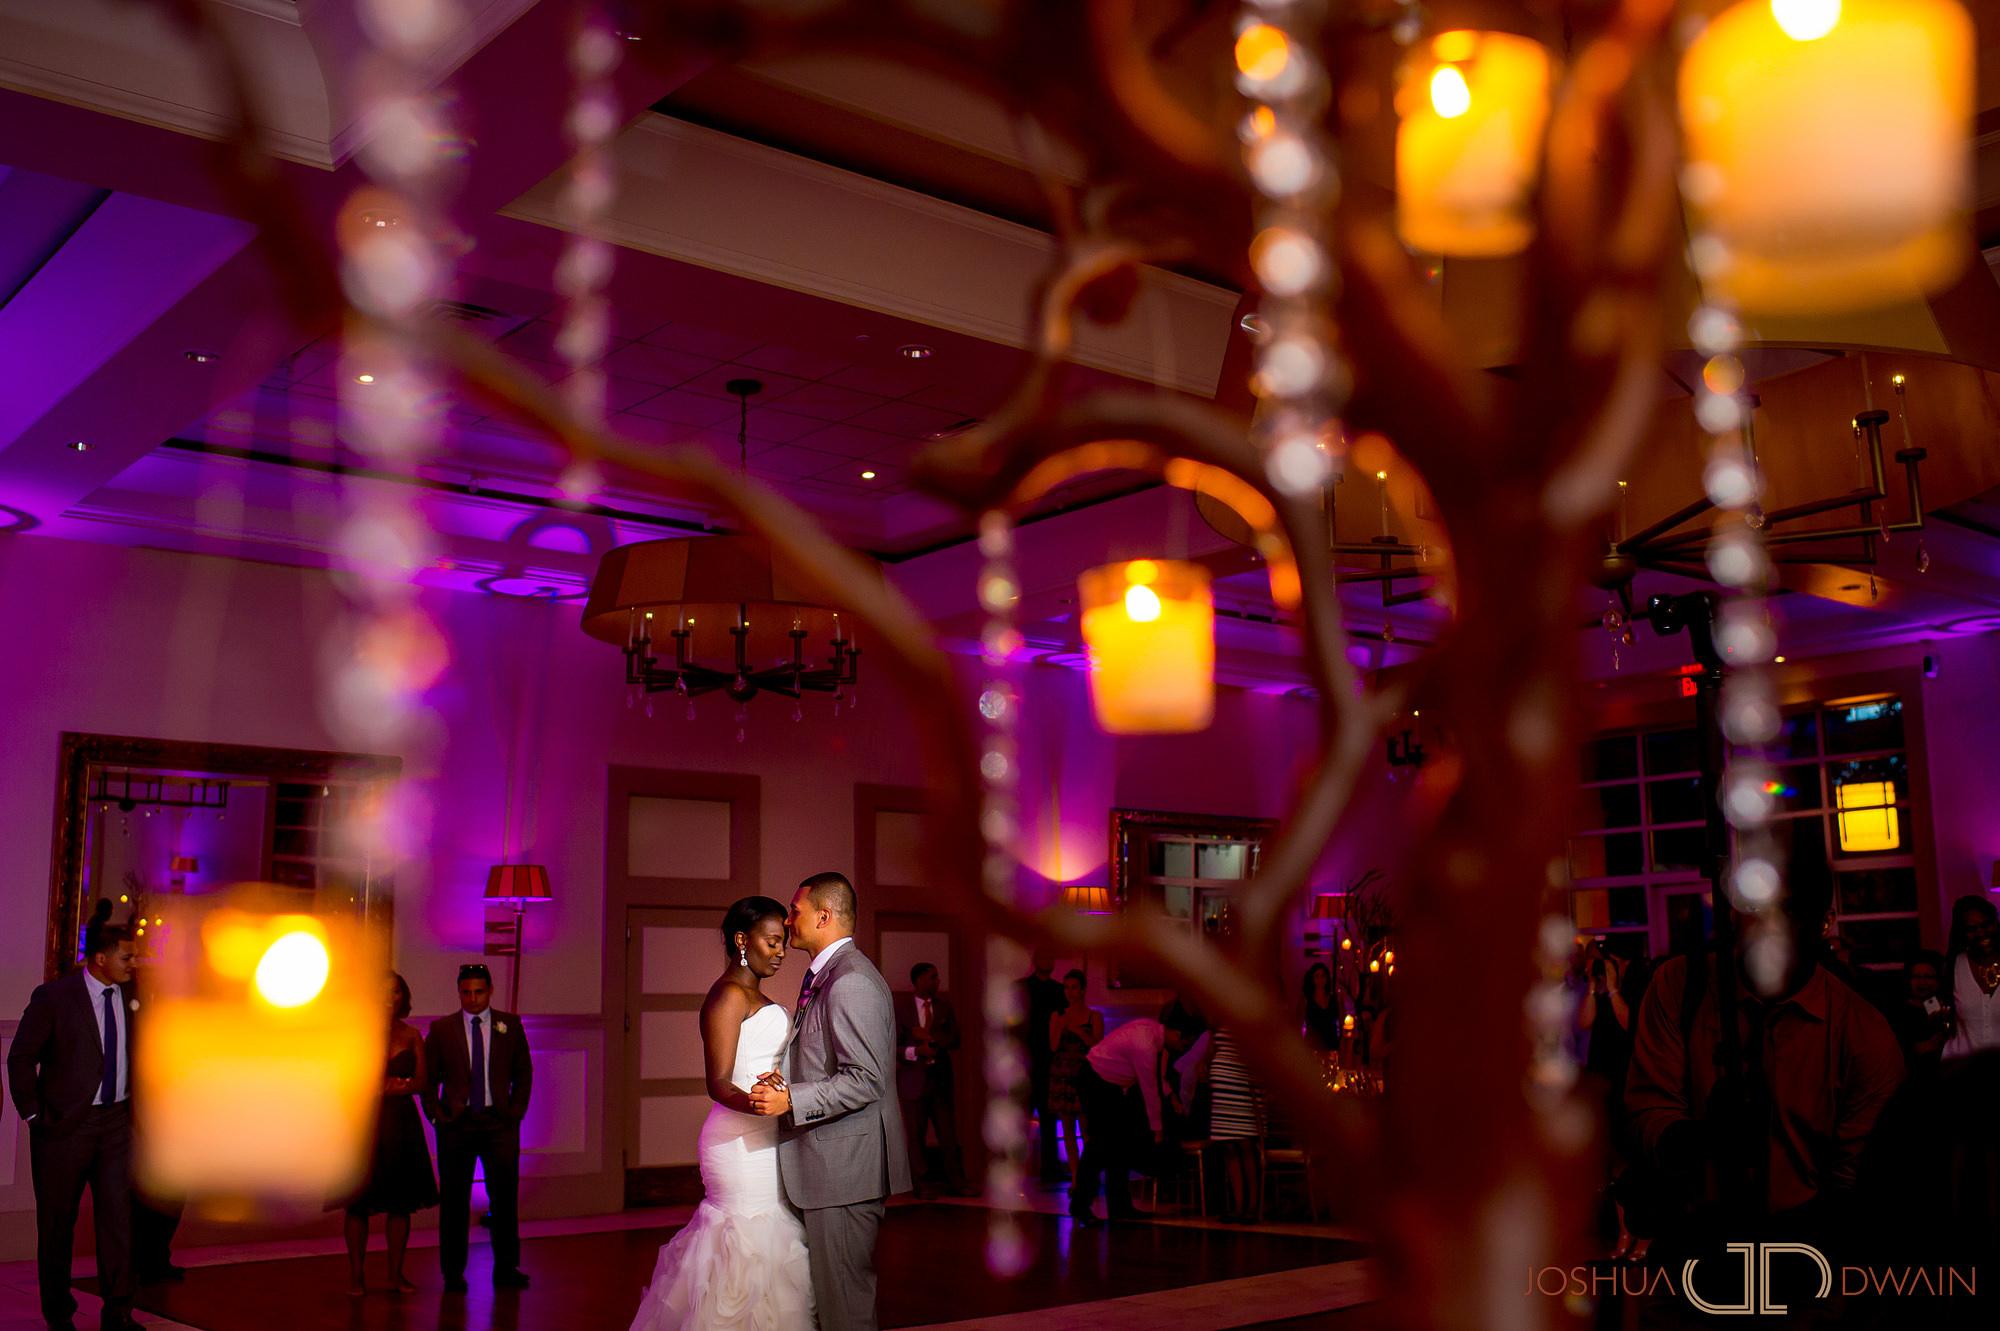 anna-edwin-025-stone-house-warren-new-jersey-wedding-photographer-joshua-dwain